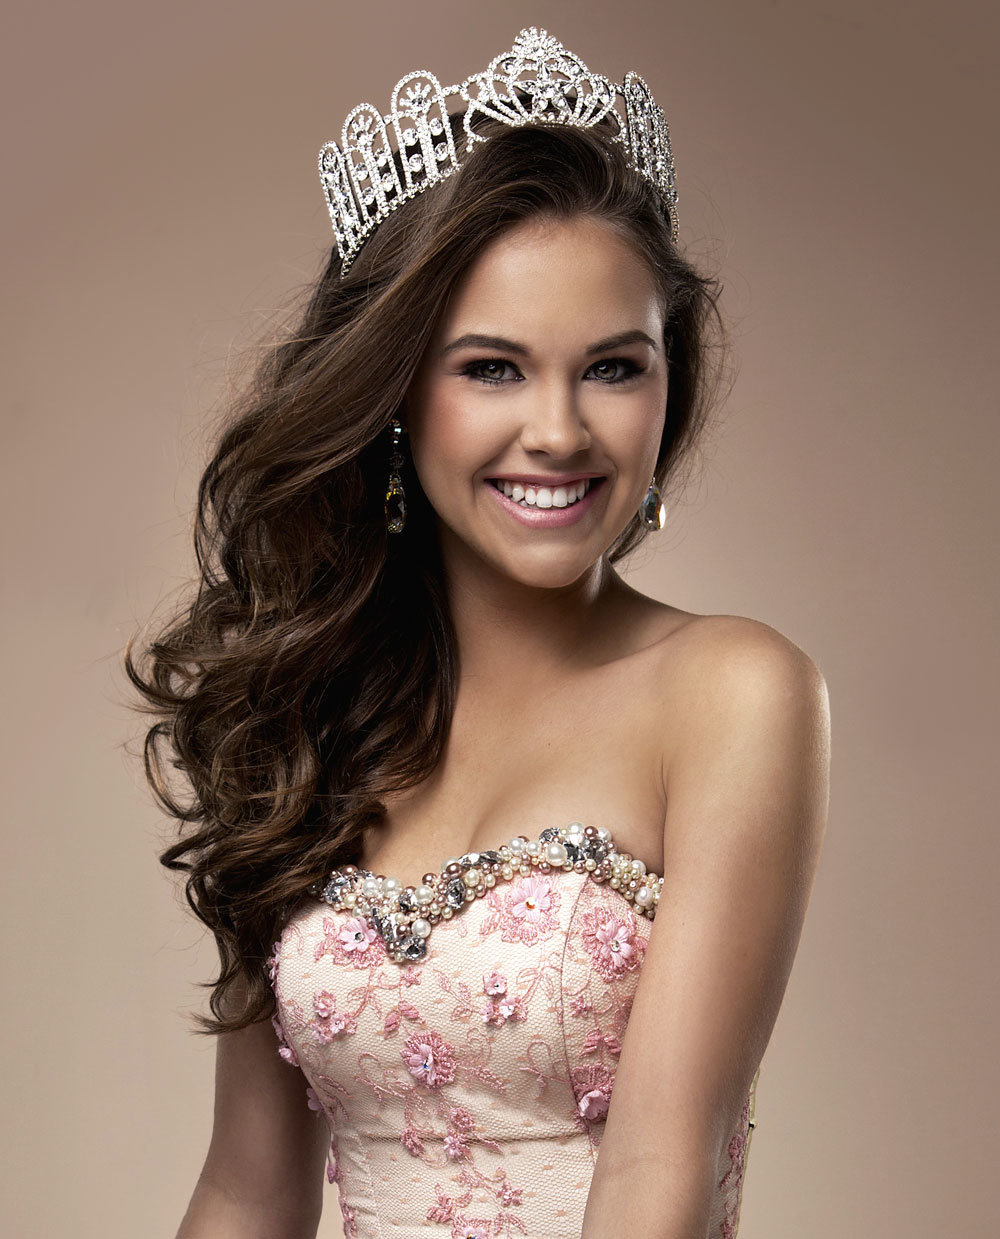 pictures-of-nevada-beauty-queen